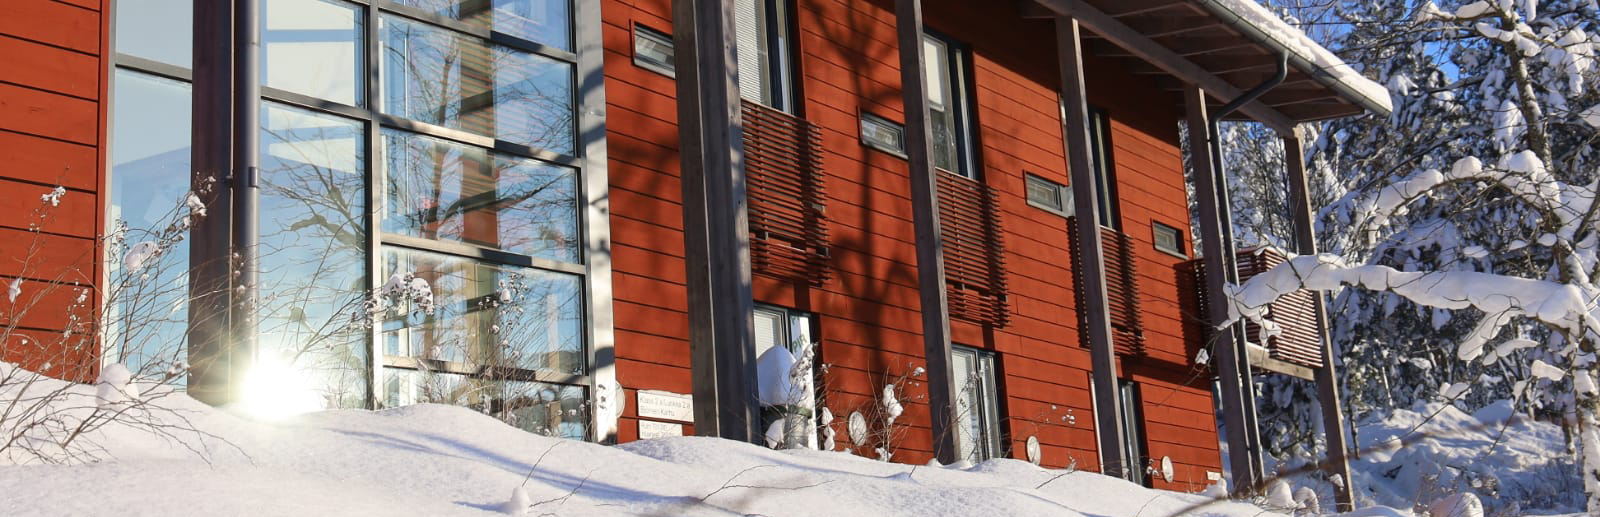 Haltia Lake Lodge hotel building.